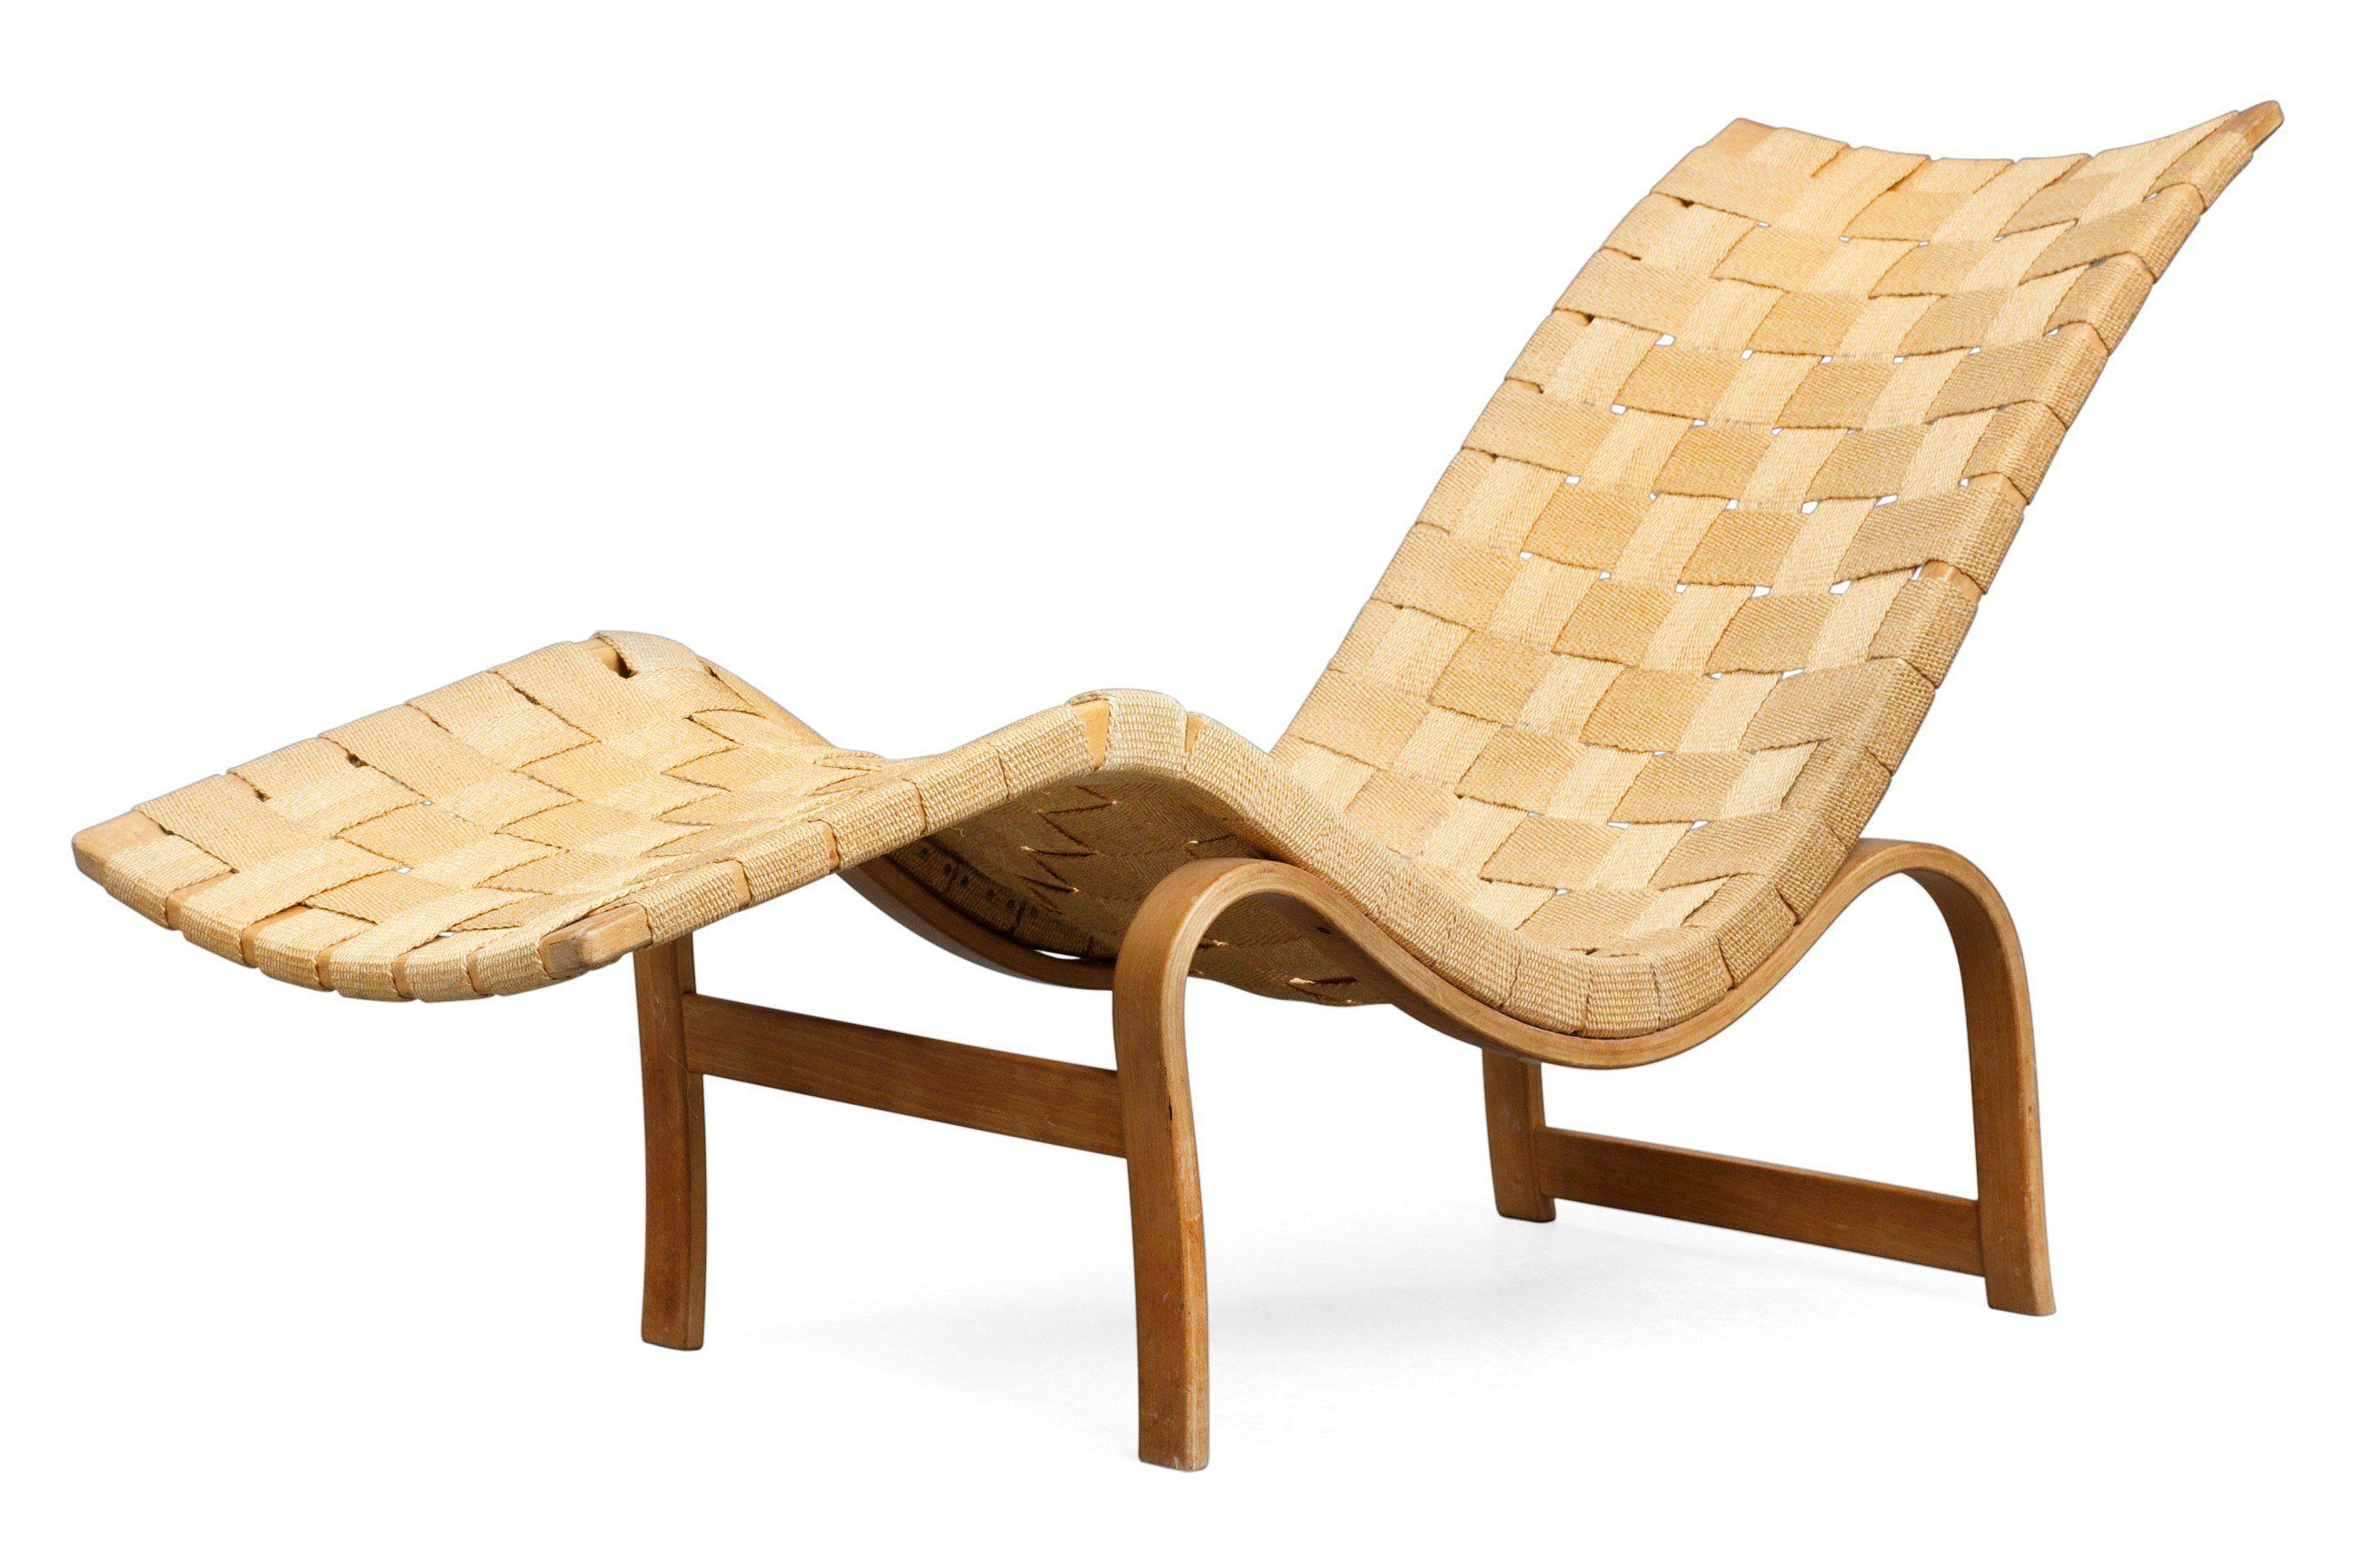 BRUNO MATHSSON - Loungechair mod. 36 (criada em 1936)